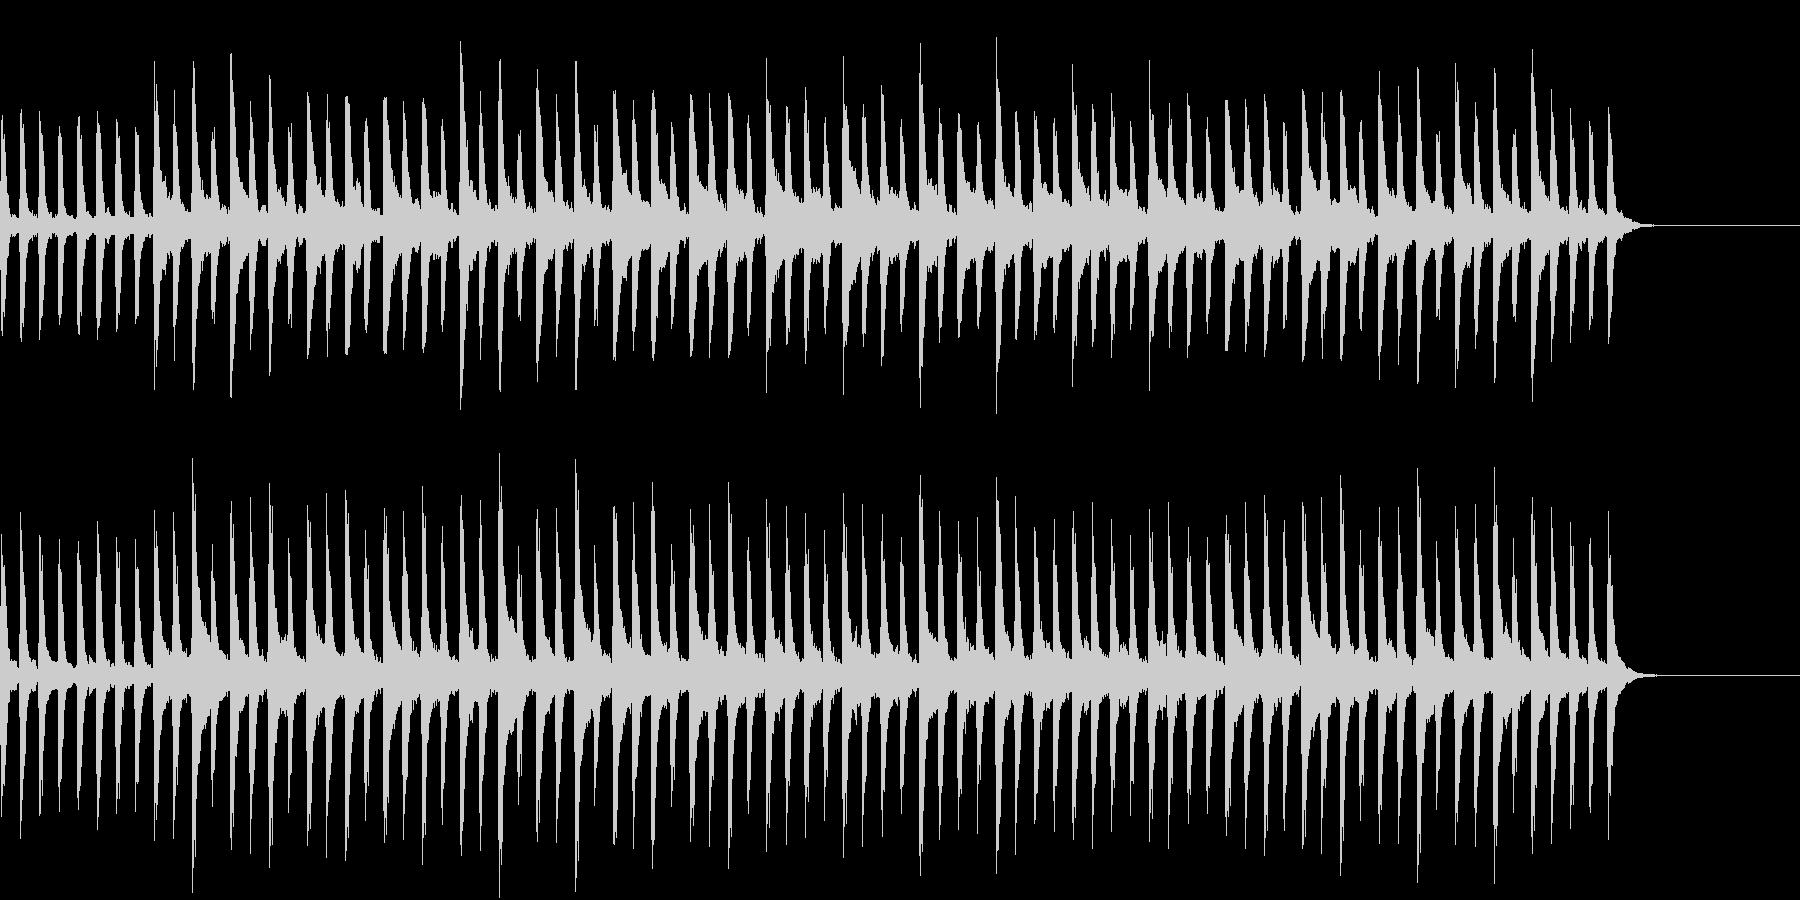 creo_leo_bgm25の未再生の波形